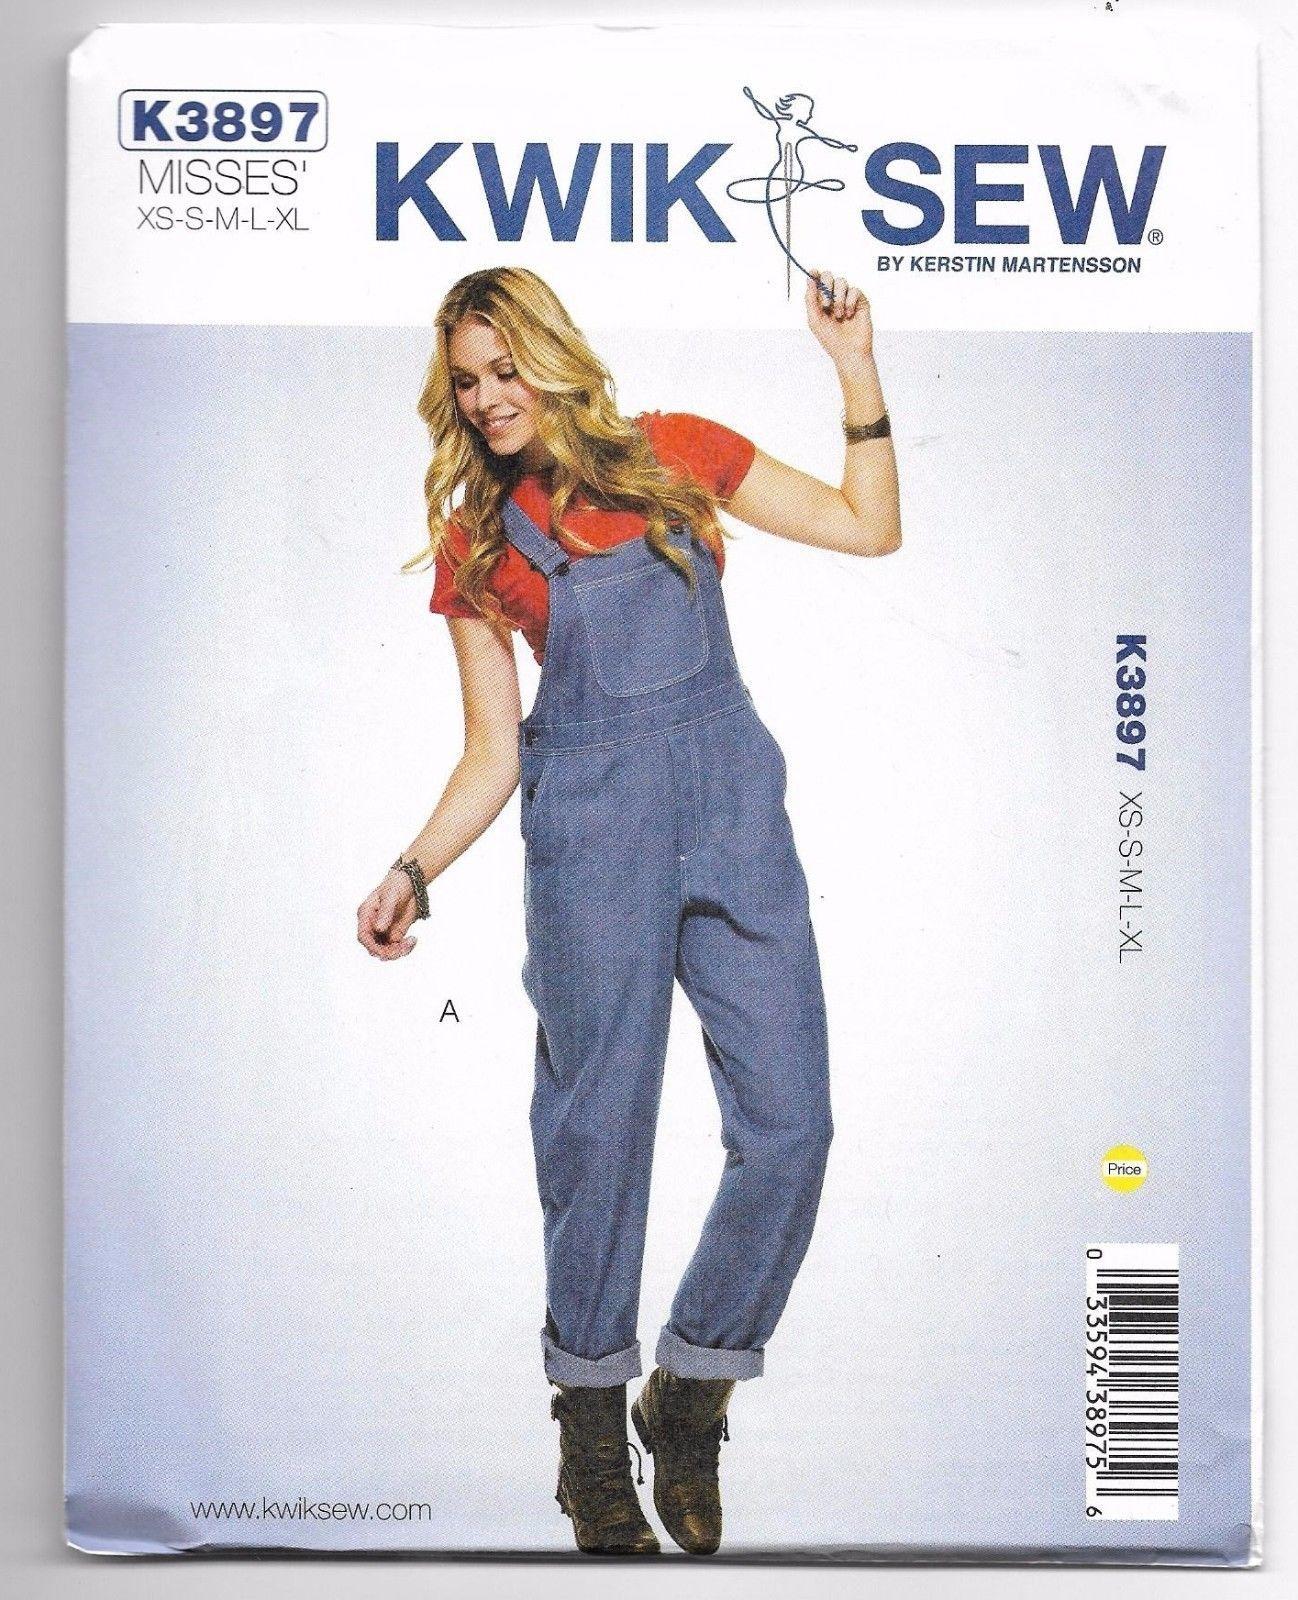 K3897 Kwik Sew Overalls Sewing Pattern Sizes XS-S-M-L-XL